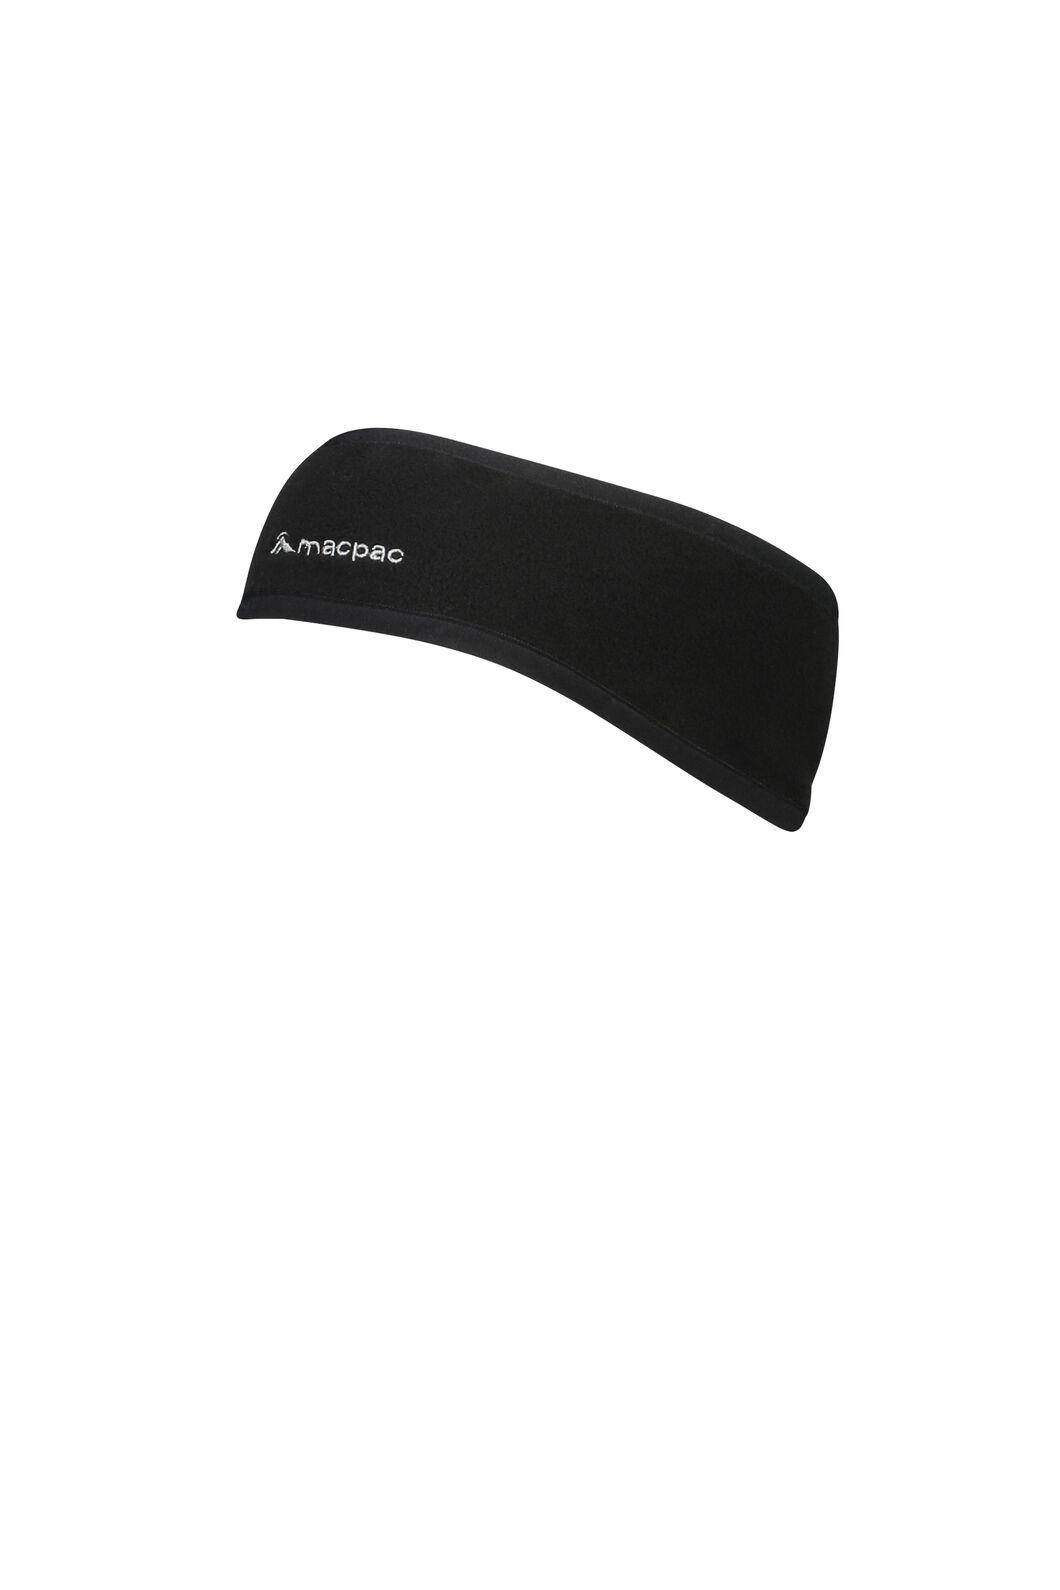 Tieke Fleece Headband V2, Black, hi-res